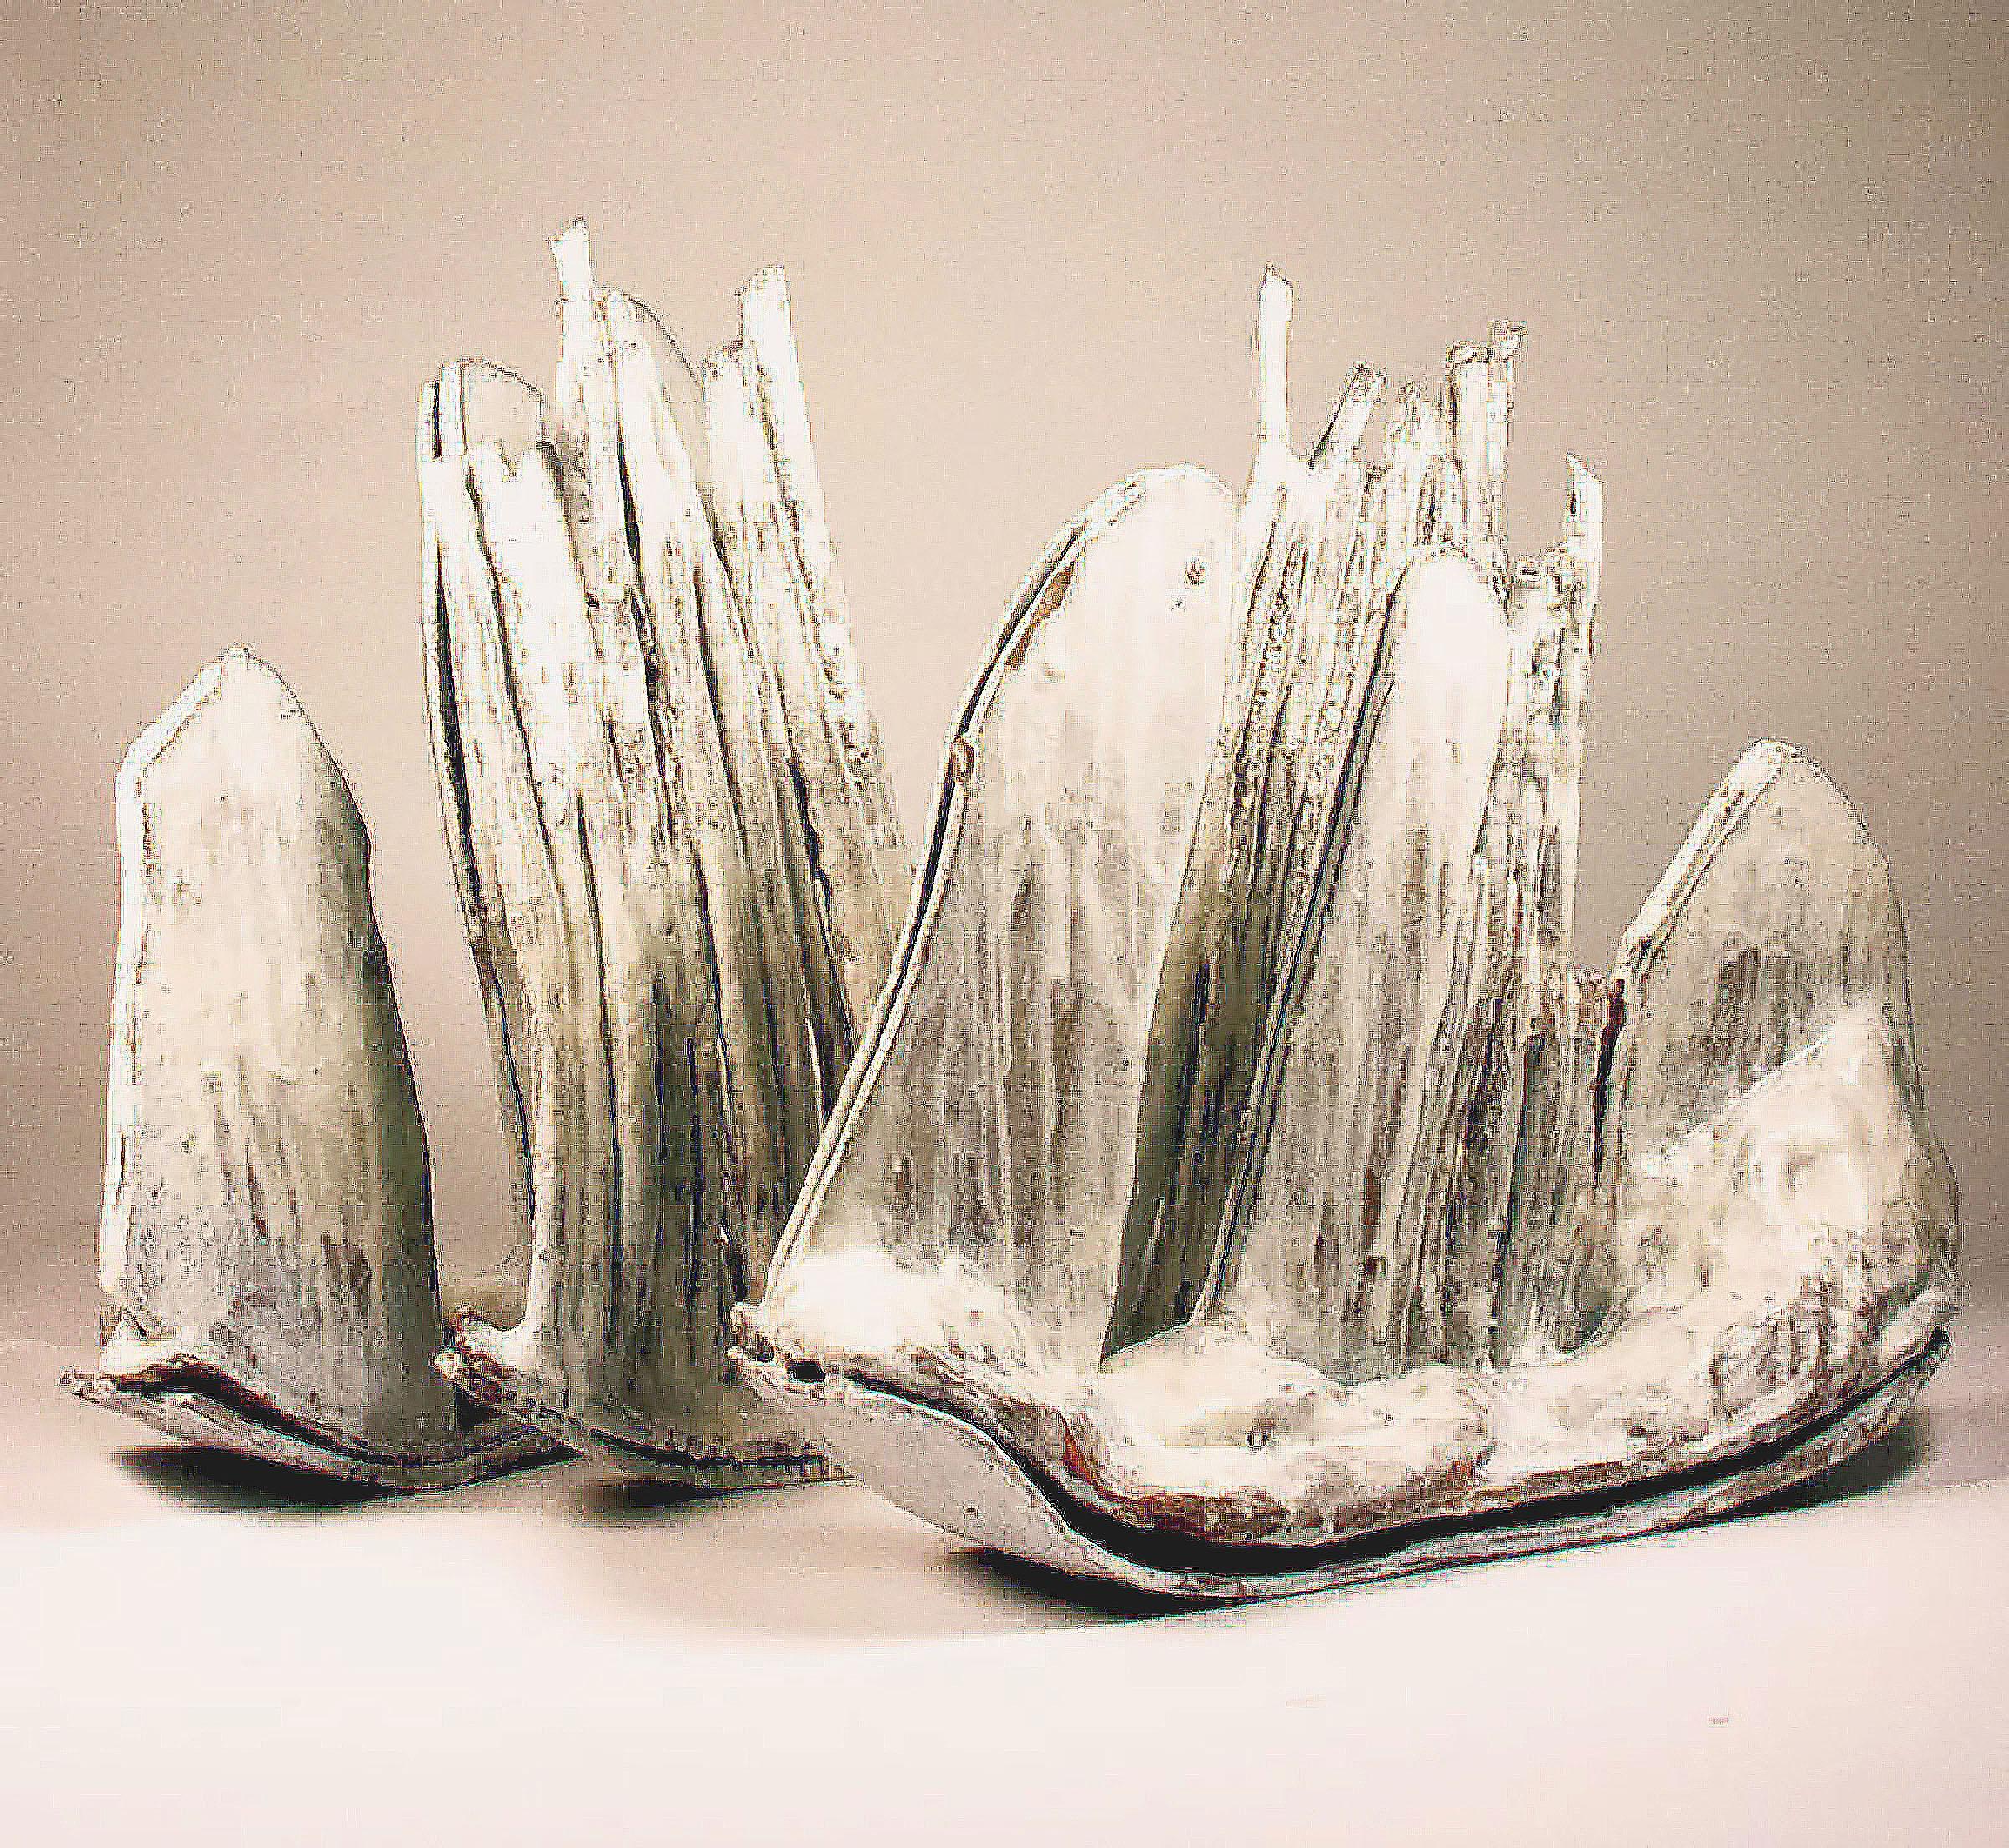 58cm W; 56cm H; 35cm D  Hand Built, Glazed Stoneware, Cone 6 Oxidation